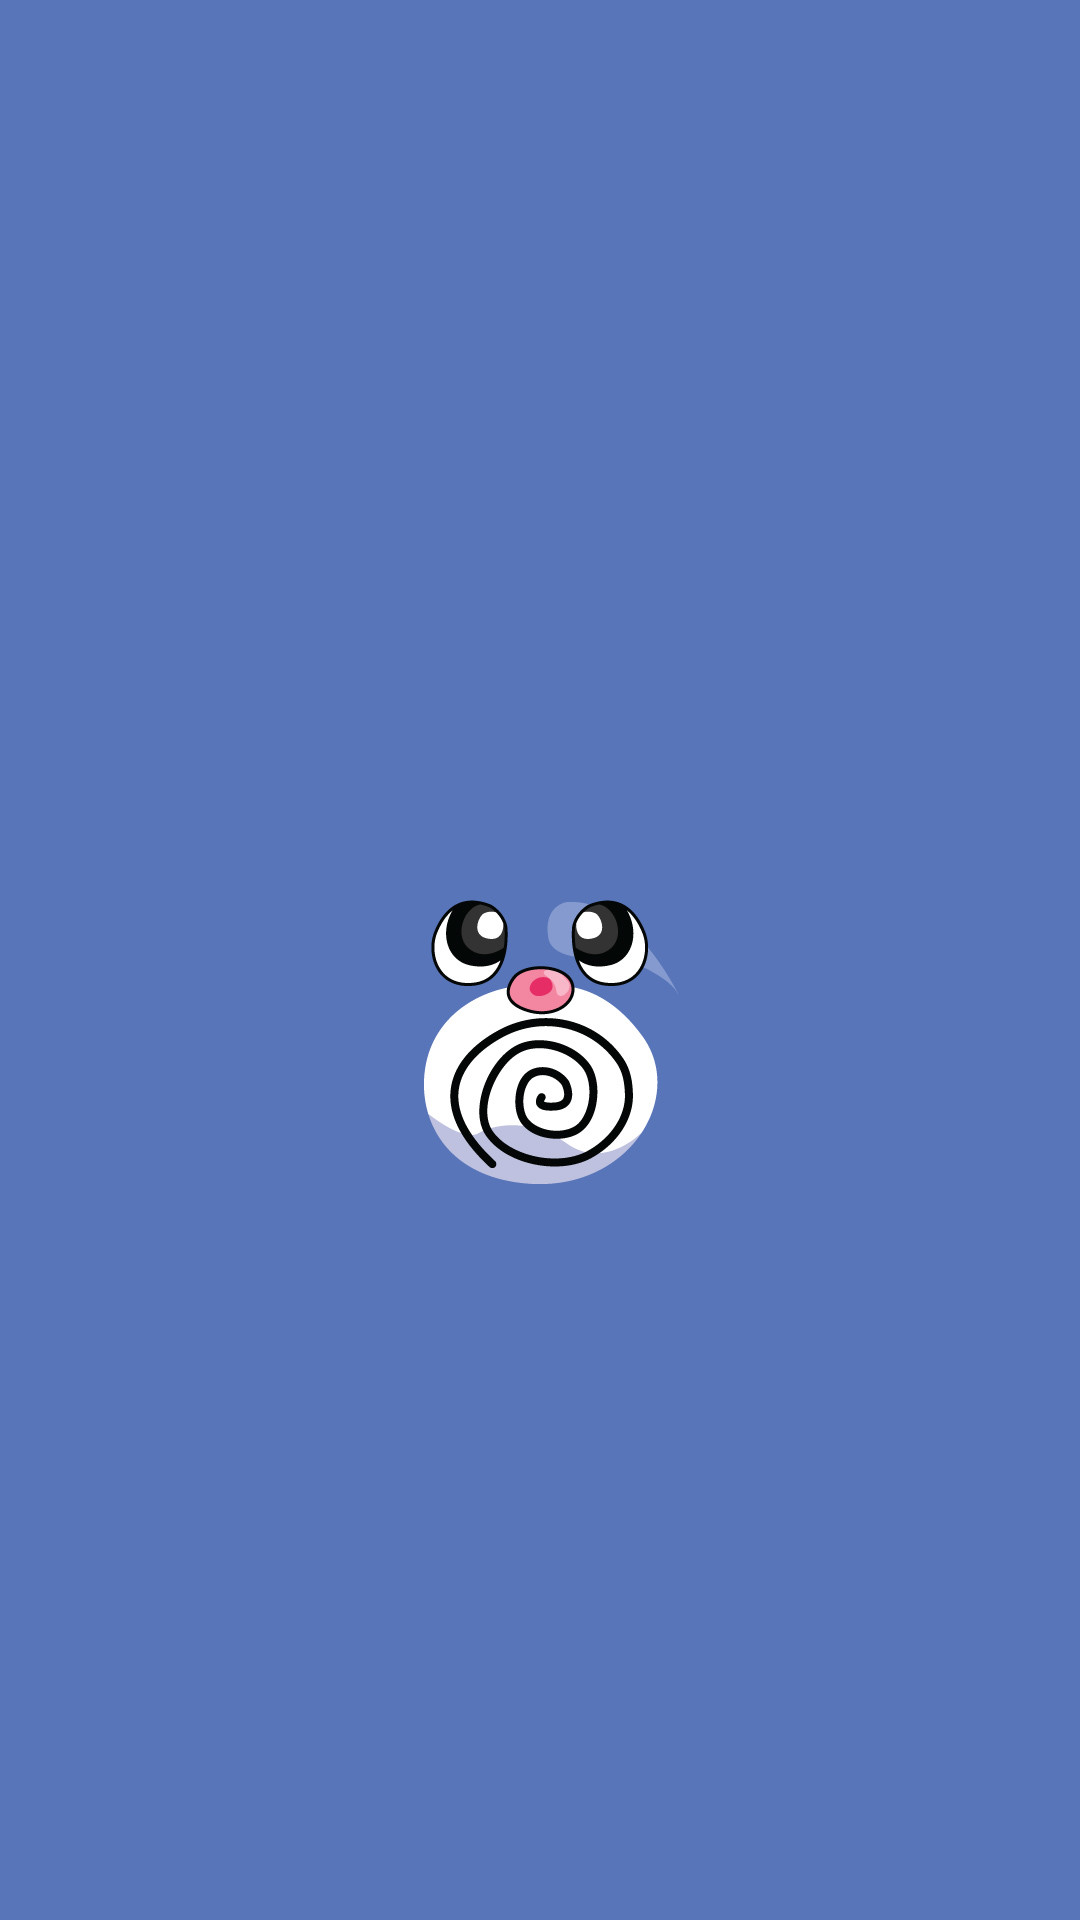 Res: 1080x1920, Poliwag Pokemon IPhone 6+ HD Wallpaper